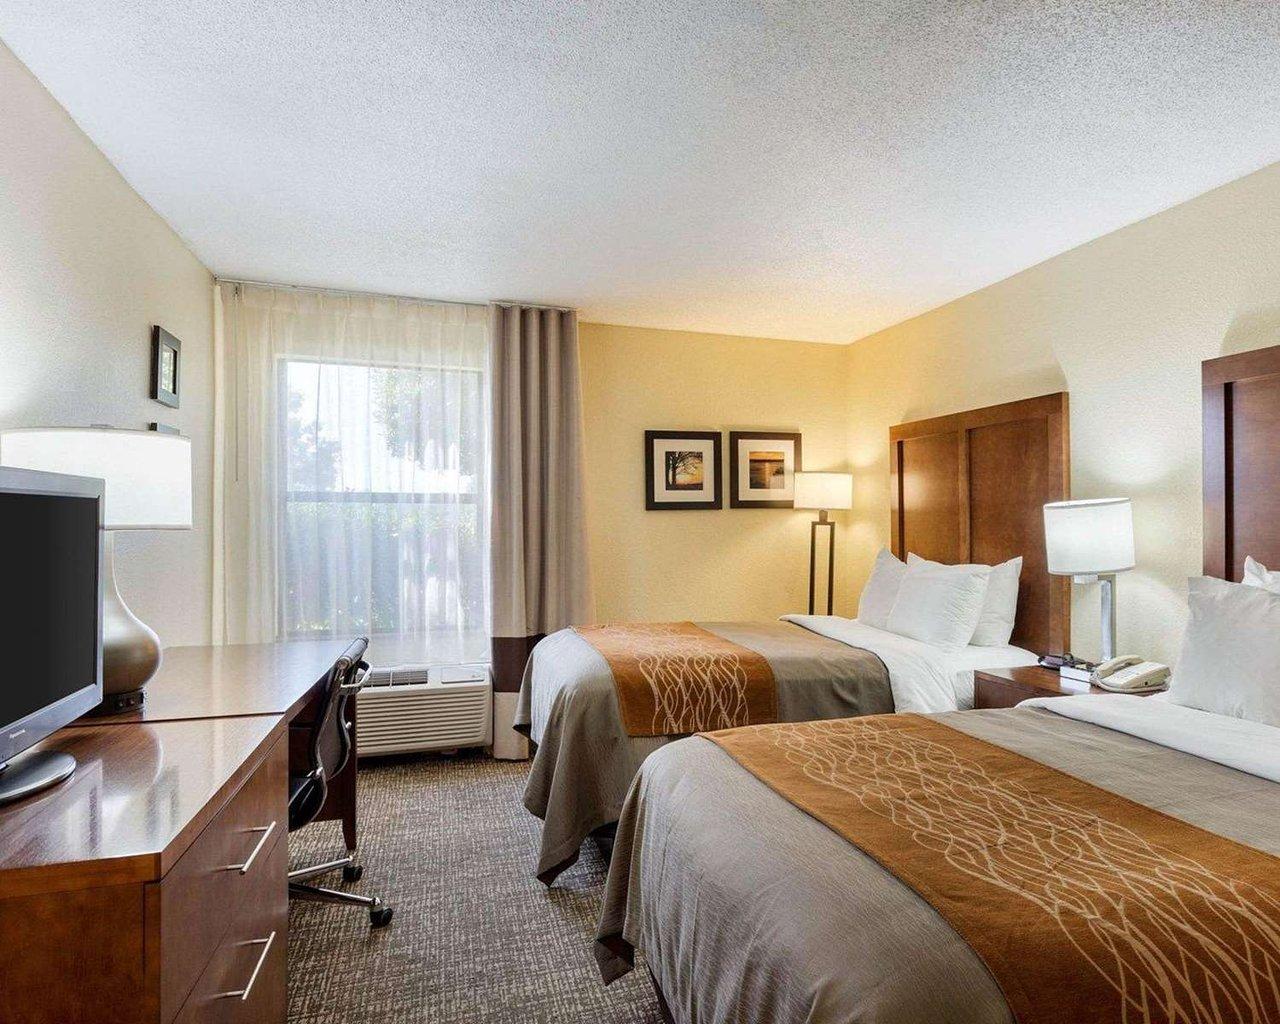 quality inn 67 8 4 updated 2019 prices hotel reviews rh tripadvisor com